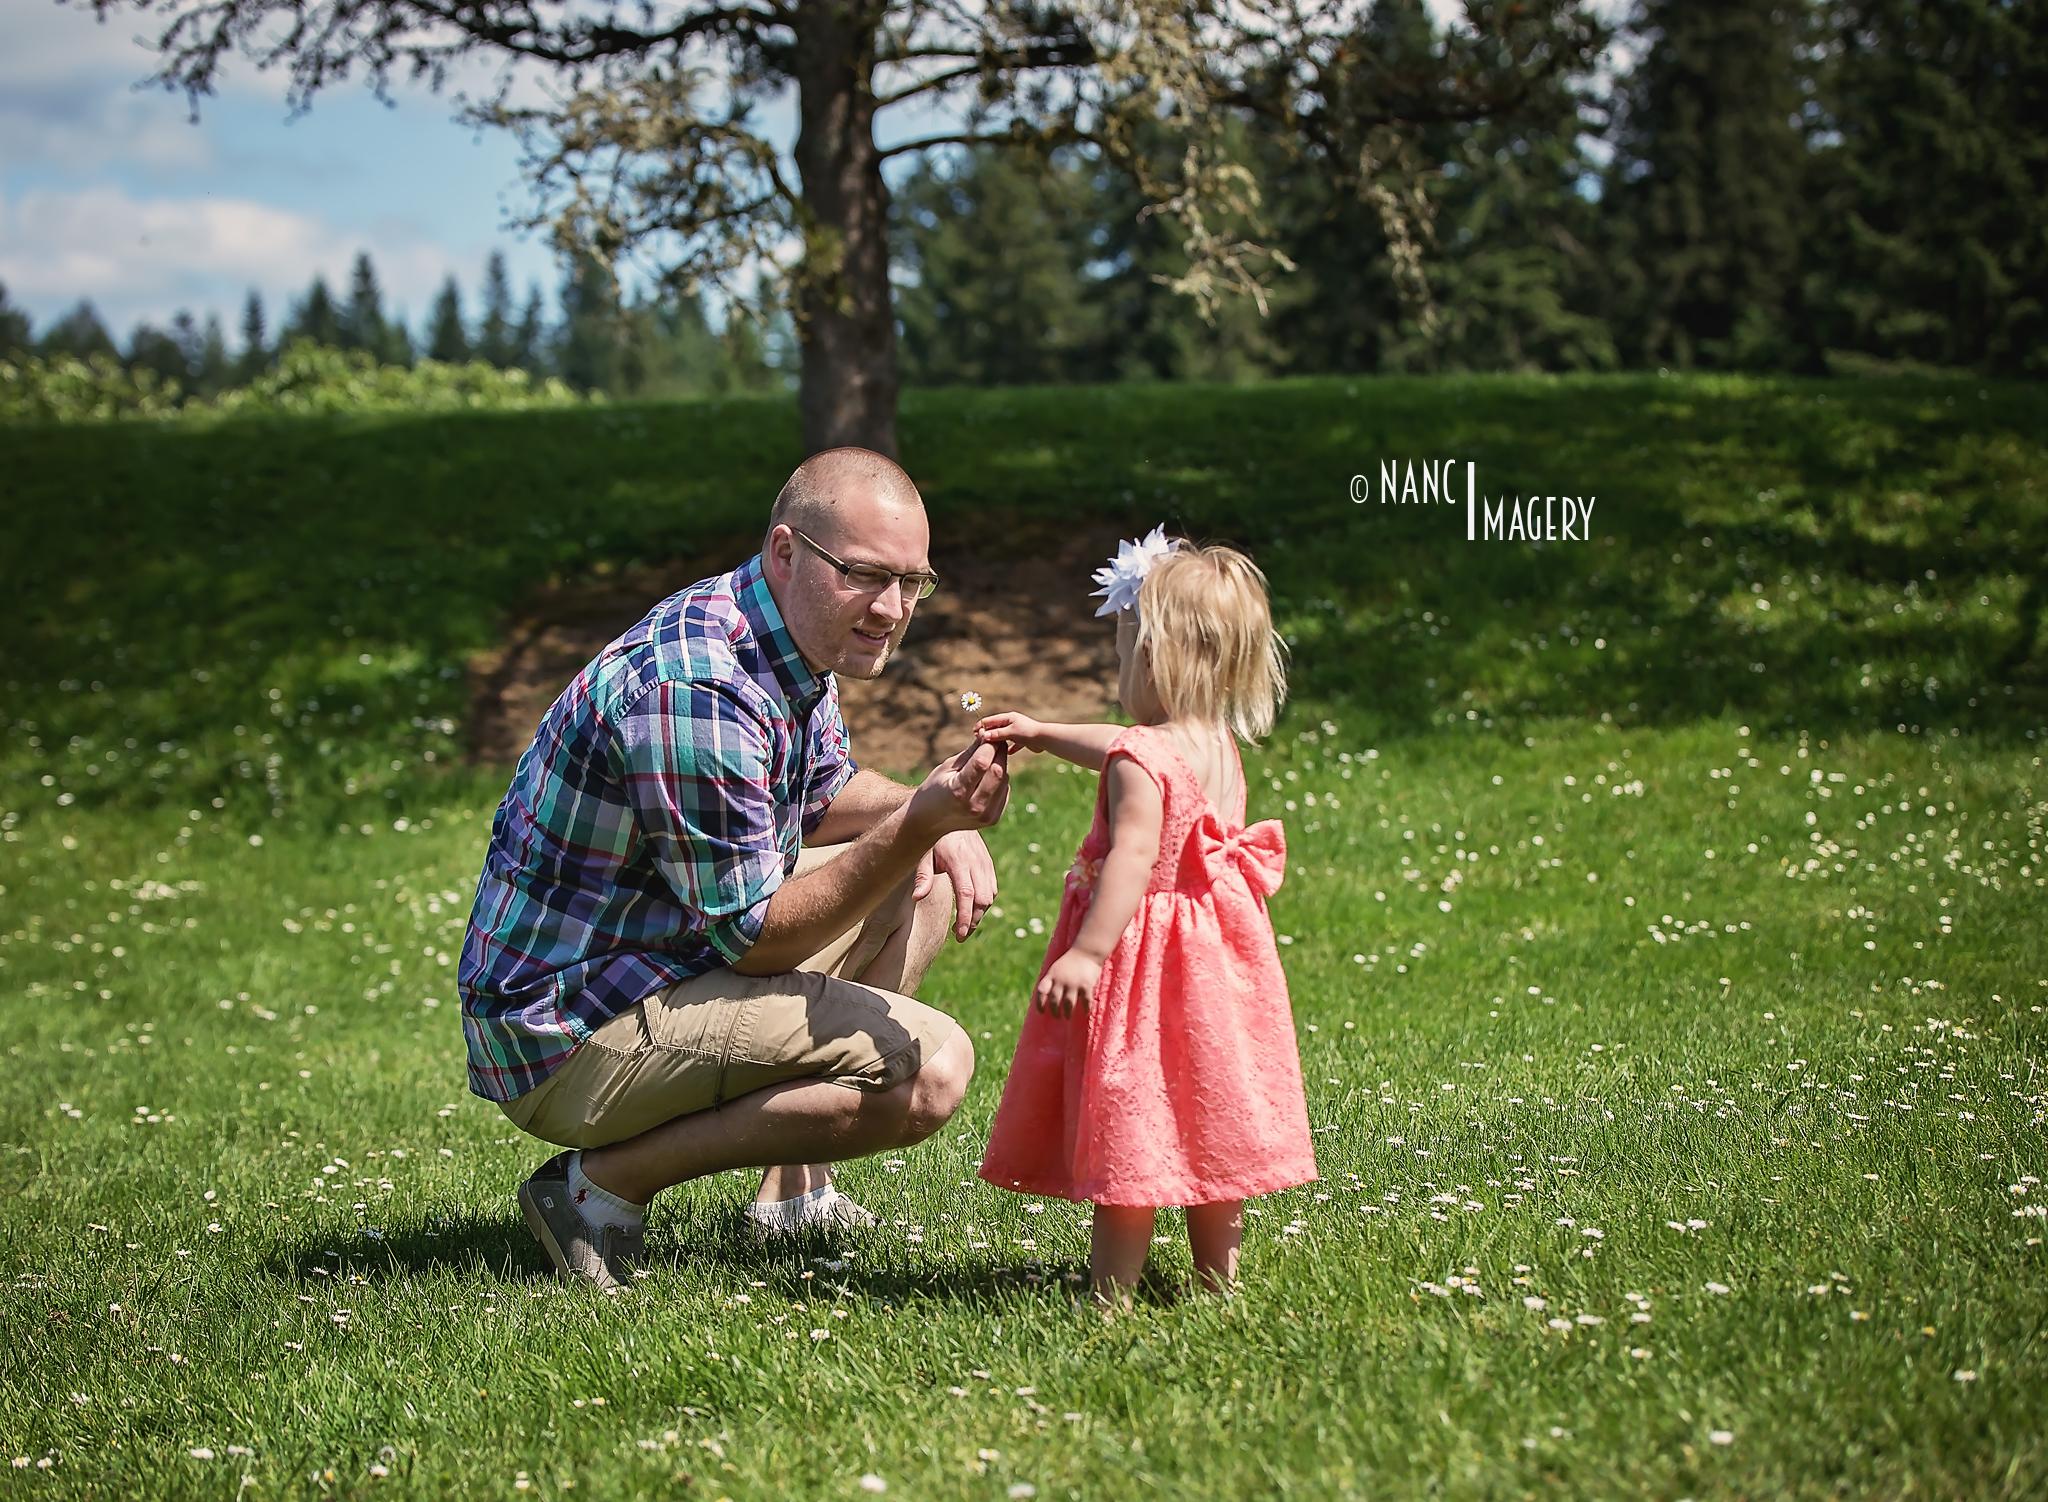 ©Nanci Imagery, Newberg Photographer, Family Portraits